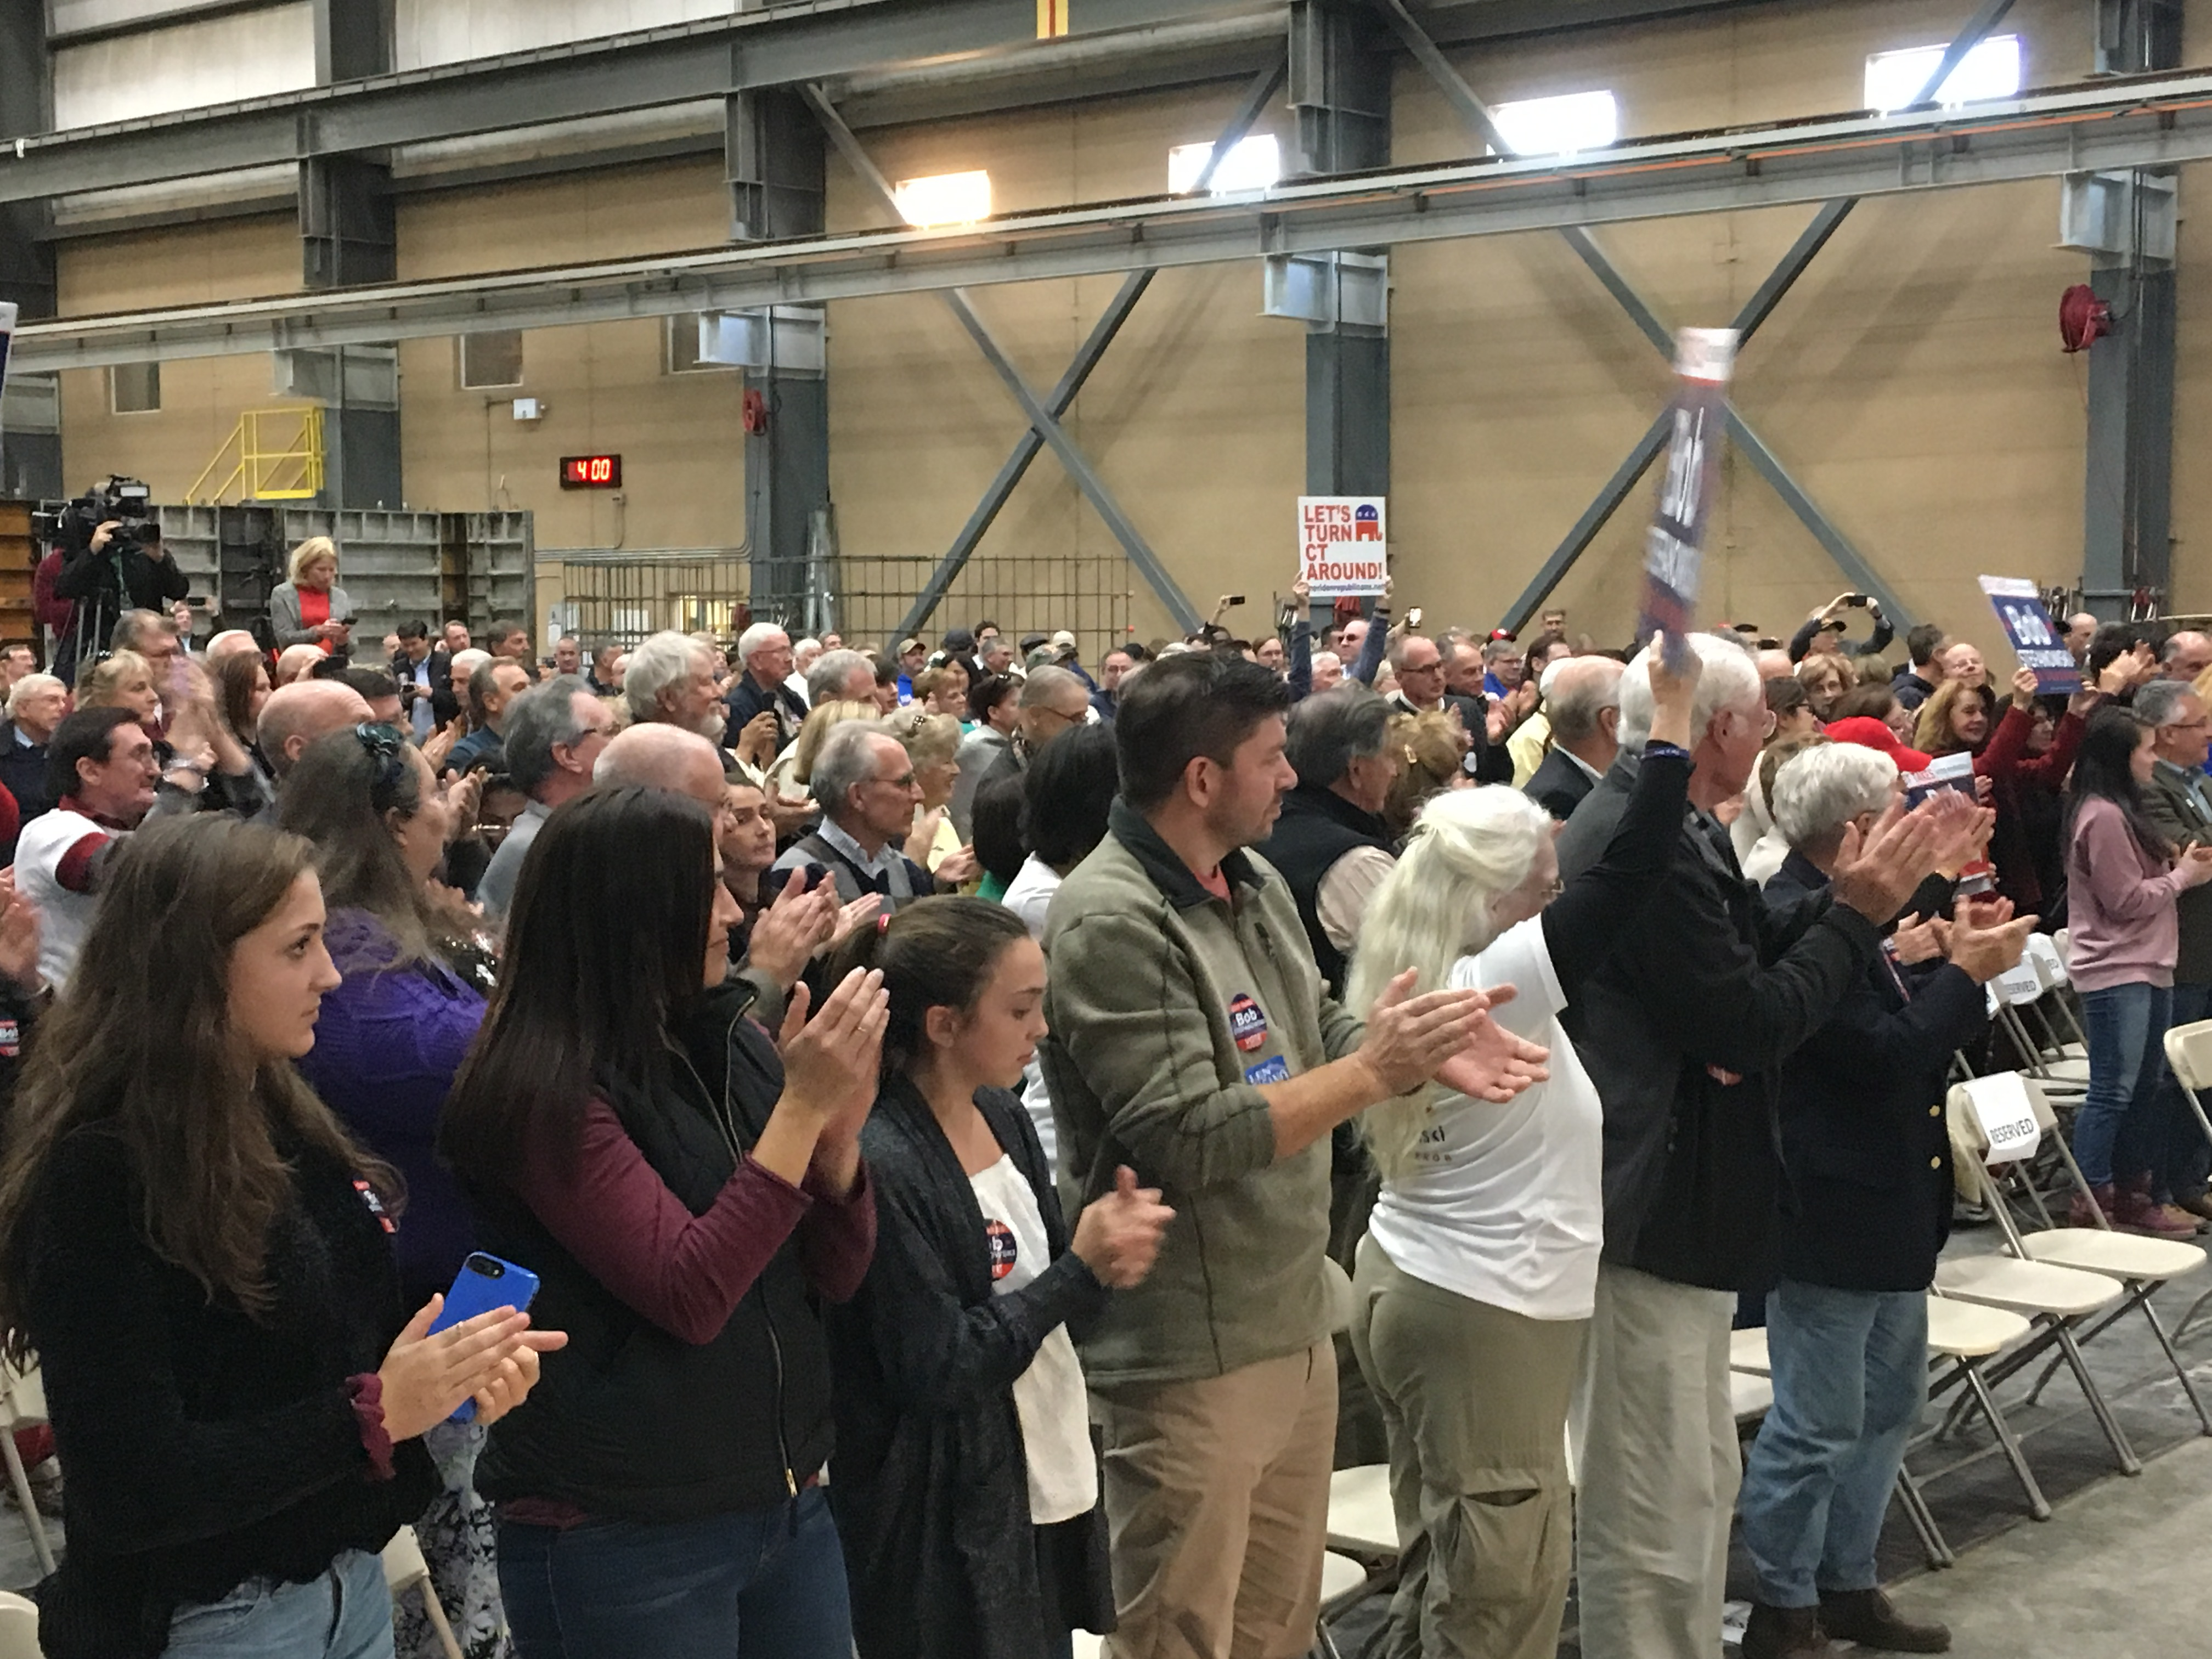 Candidates make last sprint around Connecticut before polls open